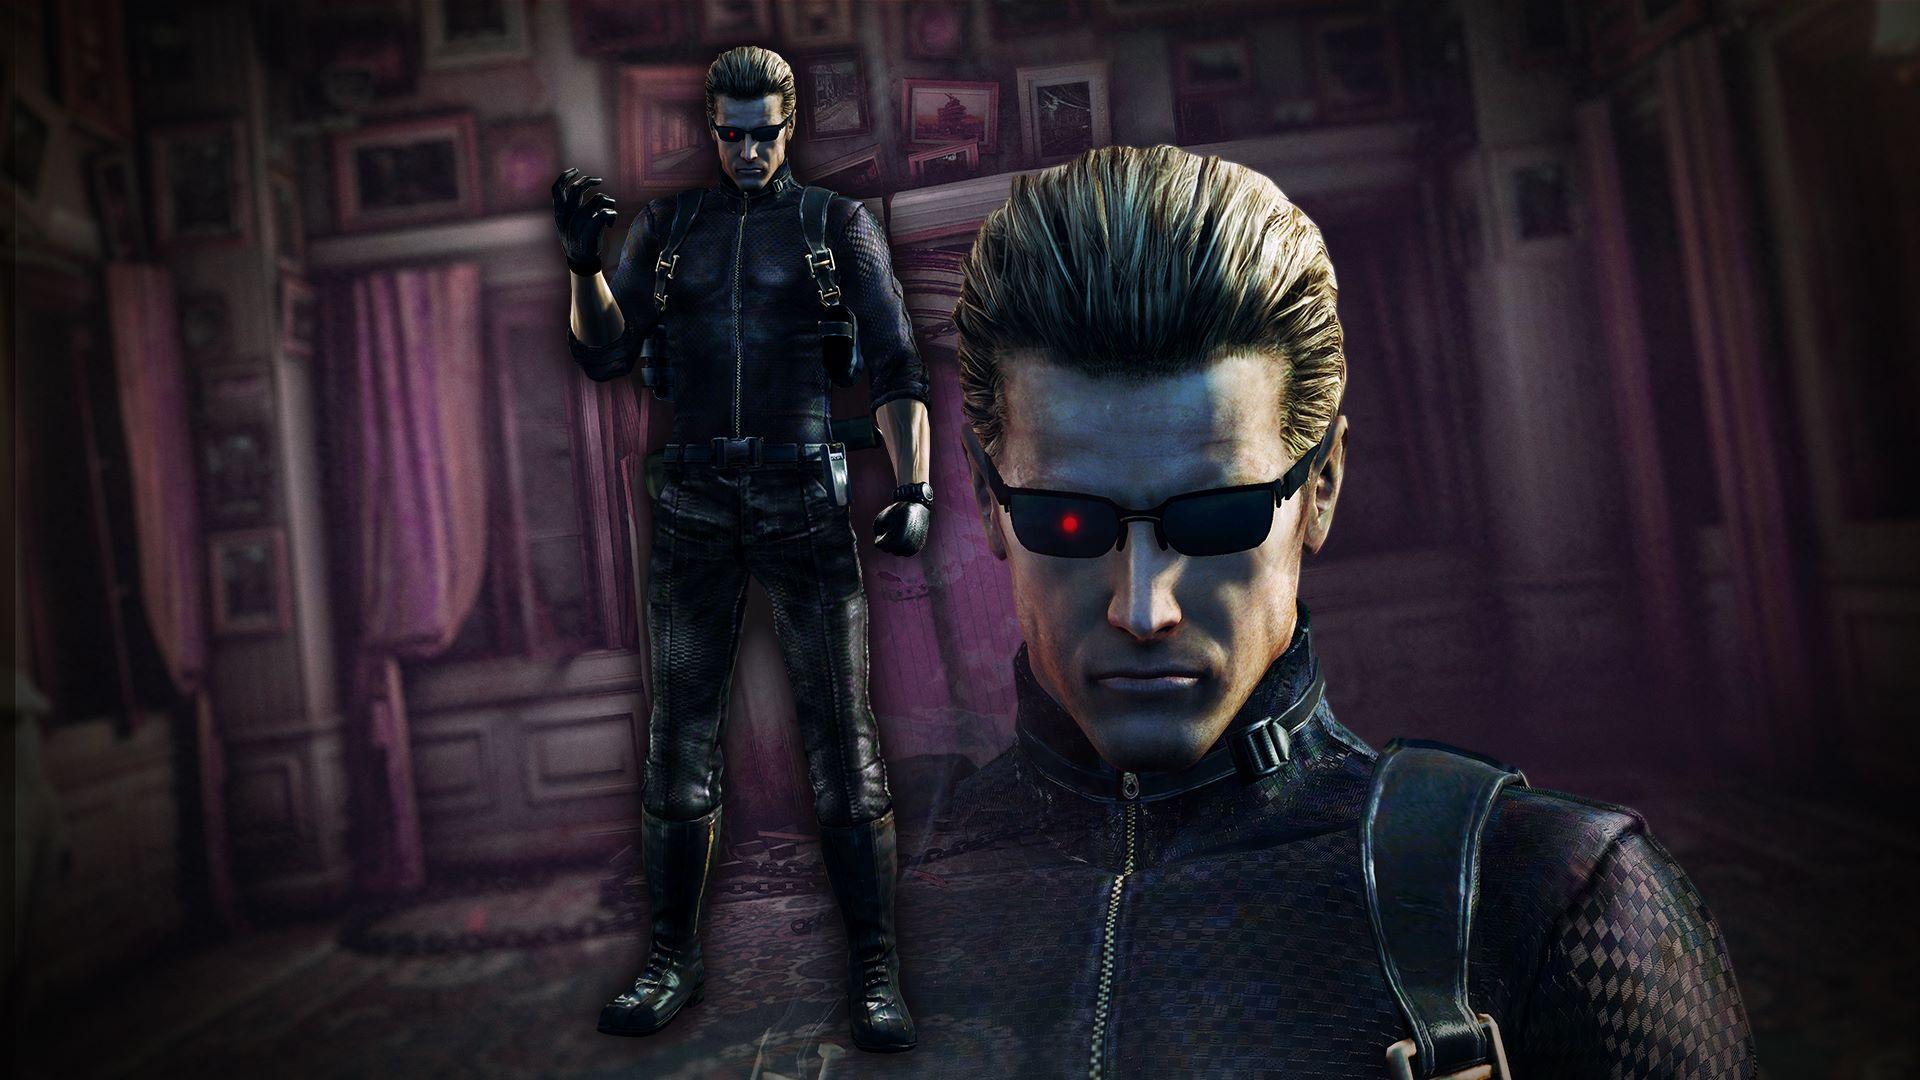 Personaje del modo Asalto: Wesker